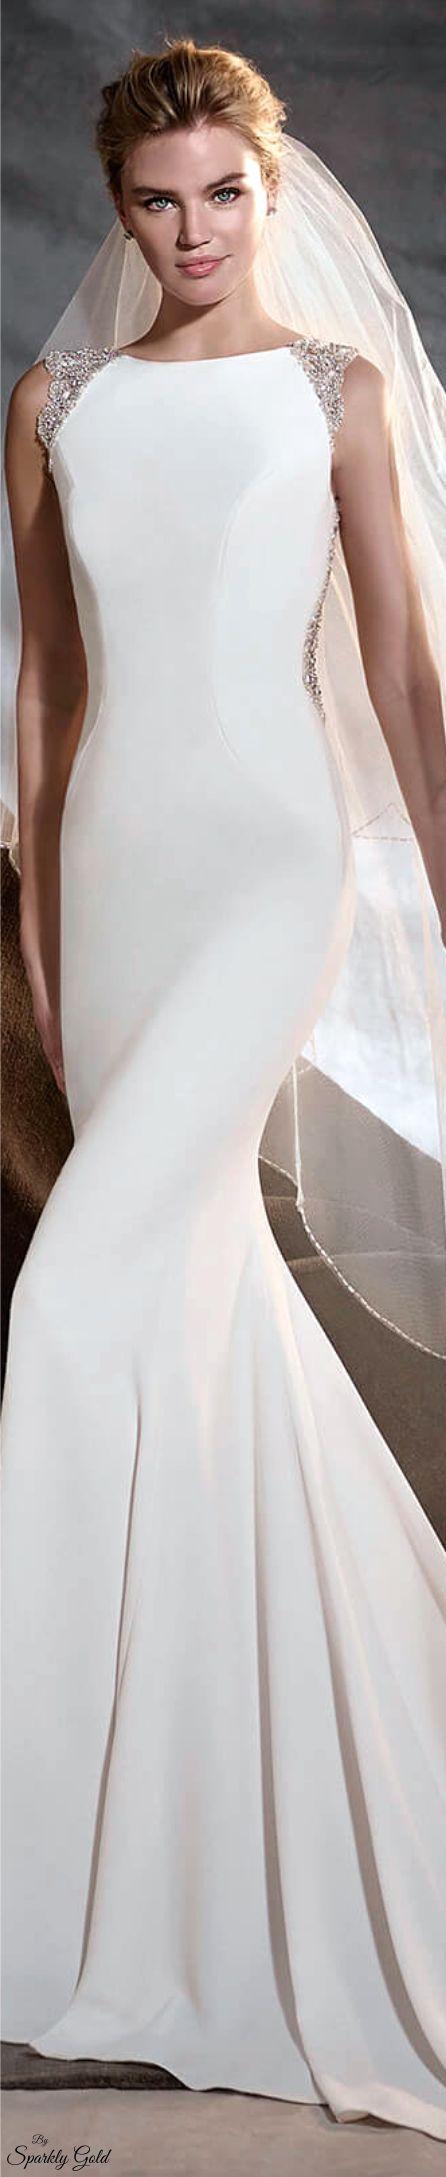 Simply sleek and elegant wedding gown. Pronovias 2017 Bride